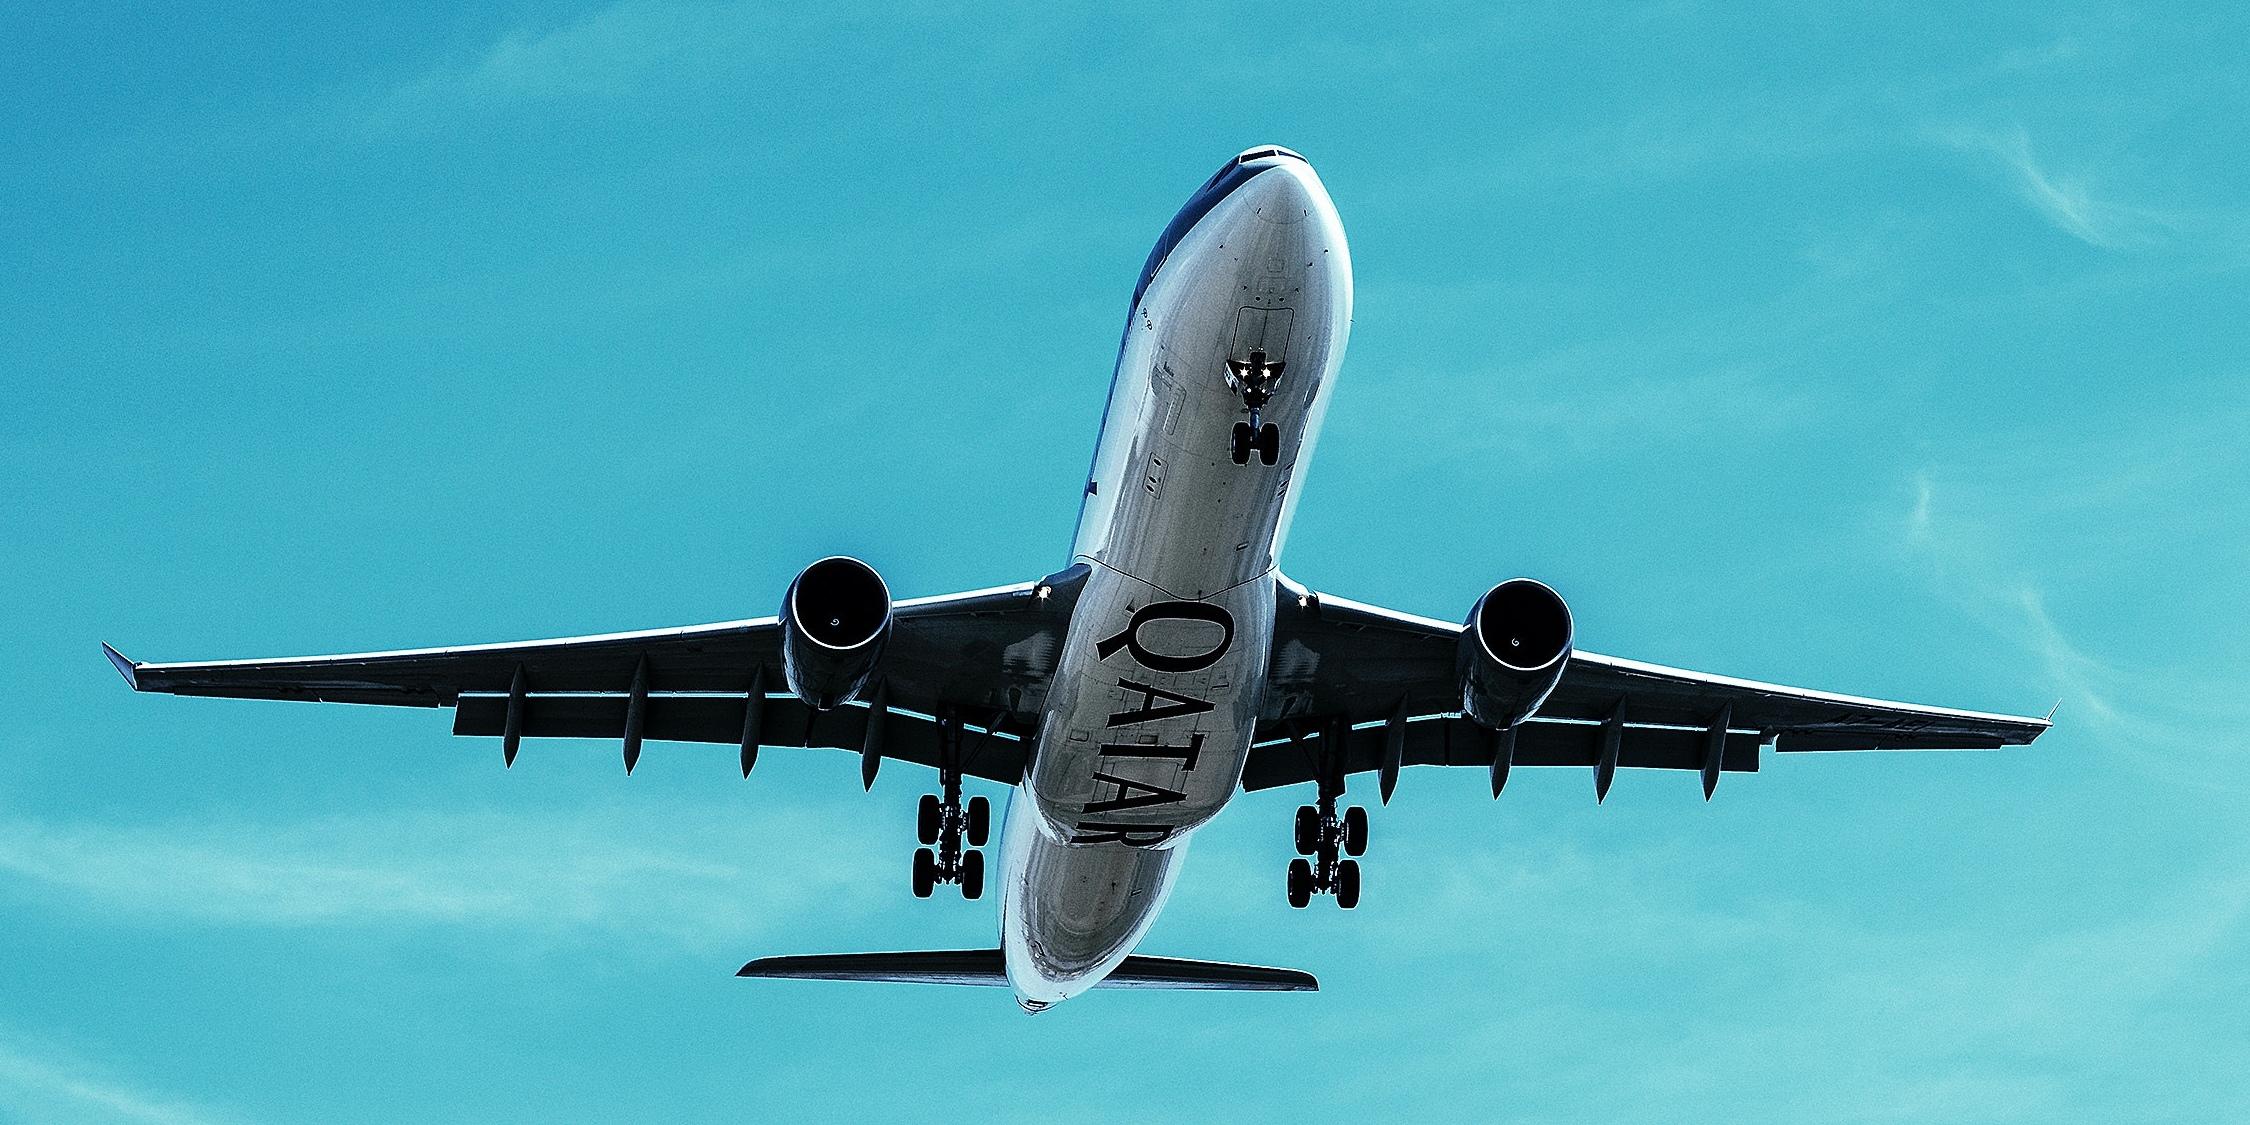 Qatar air at takeoff